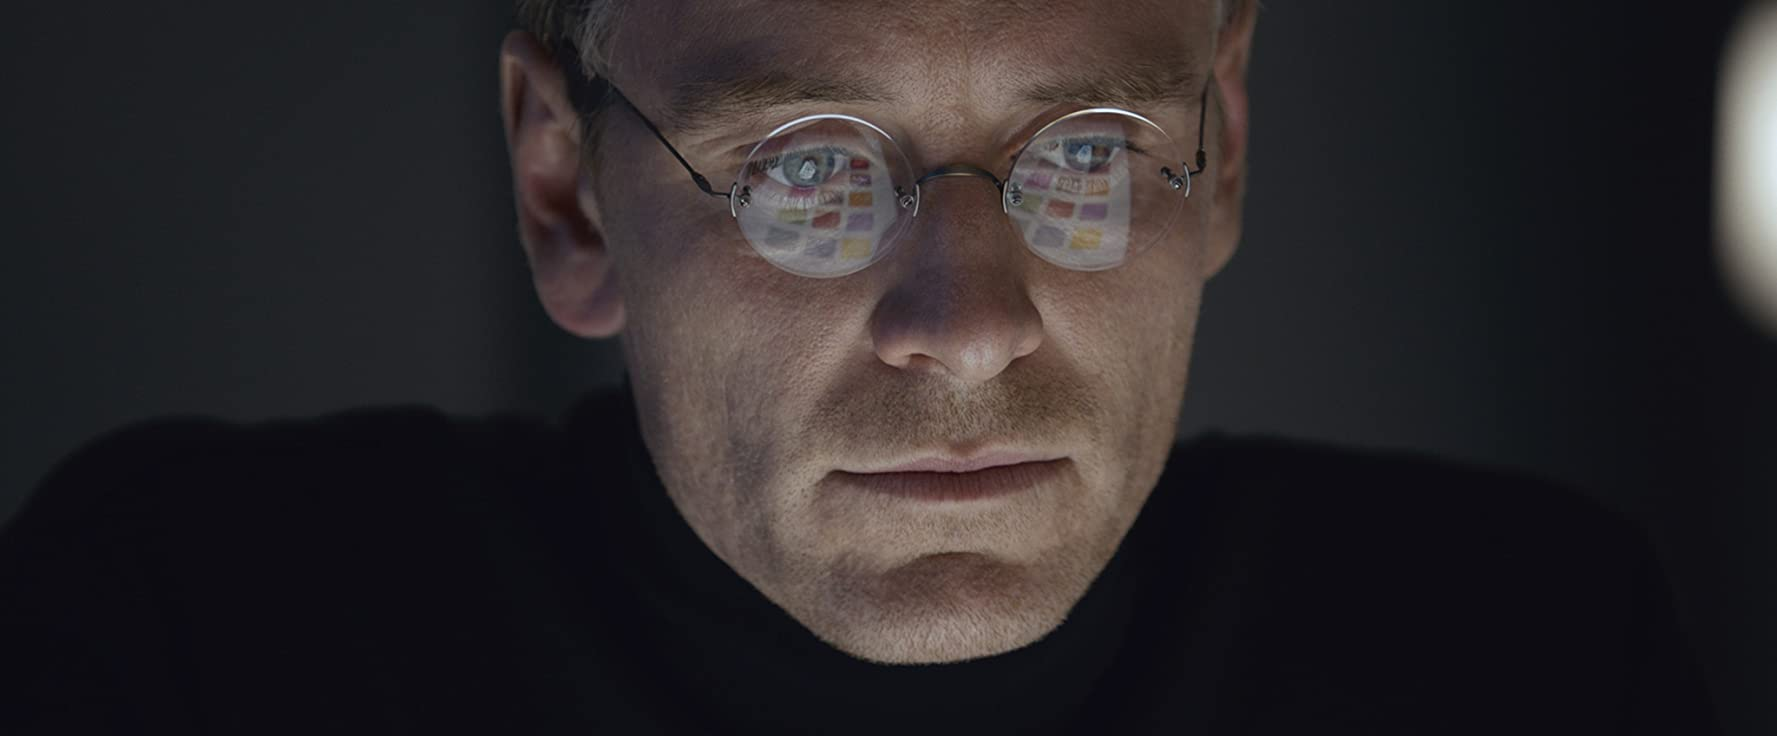 Michael Fassbender in Steve Jobs (2015)